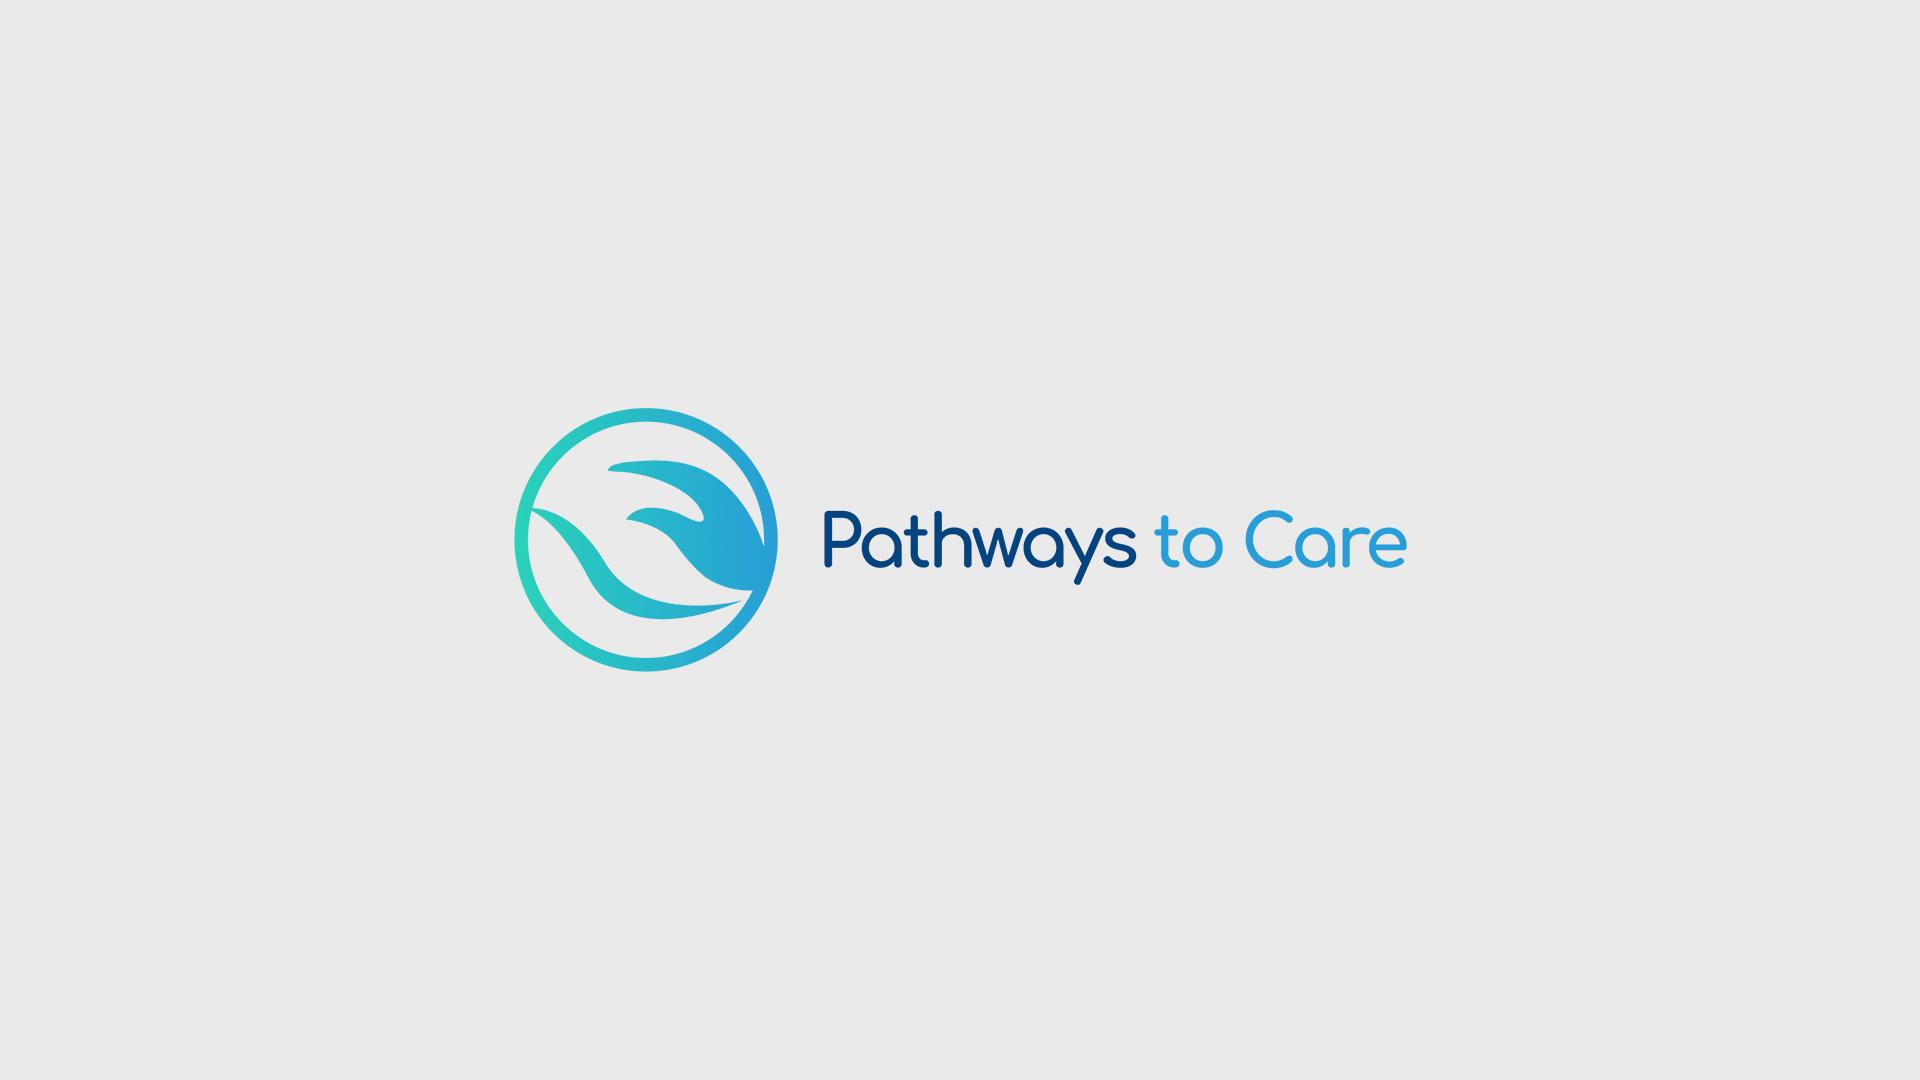 Pathways to Care - Brand Development